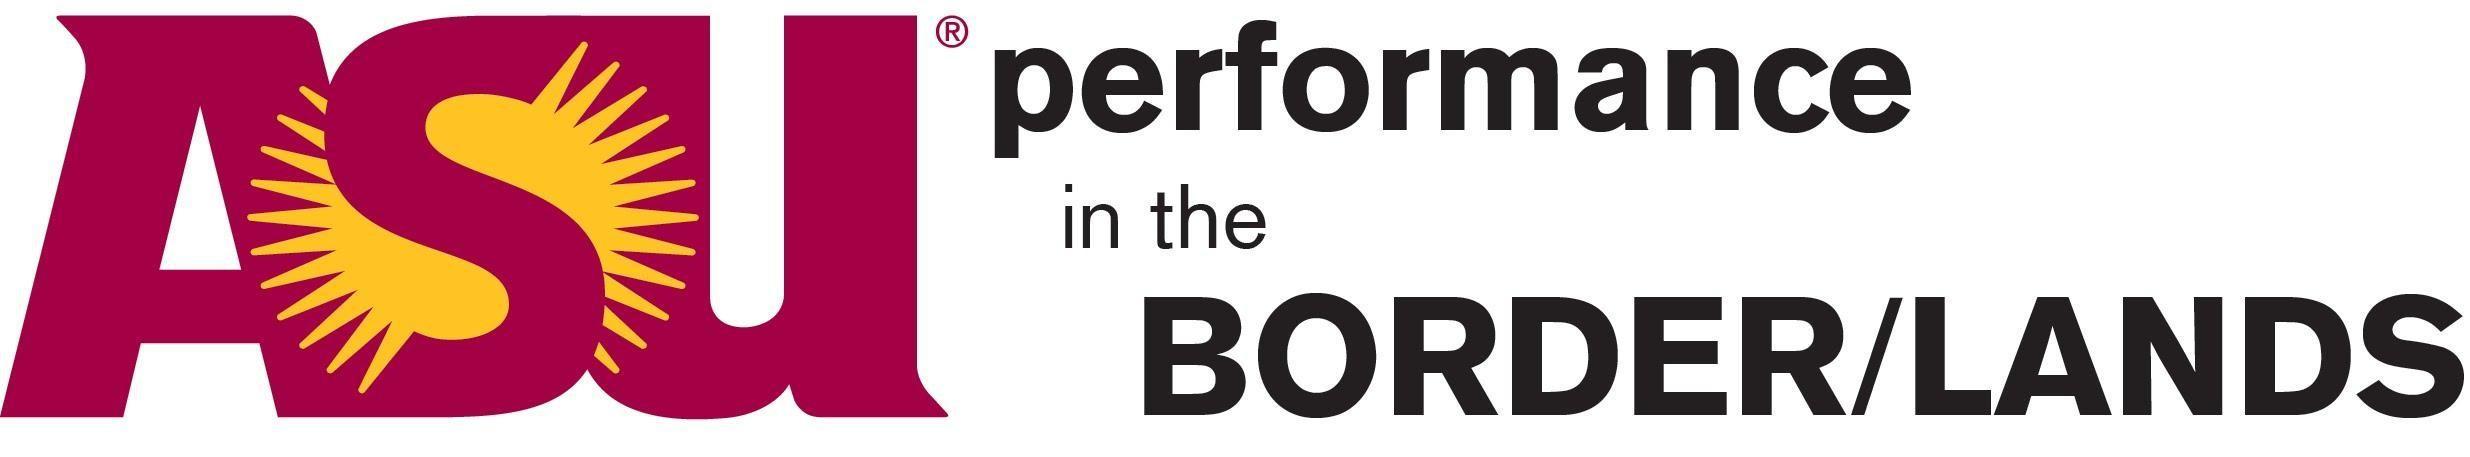 Performance in the Borderlands logo